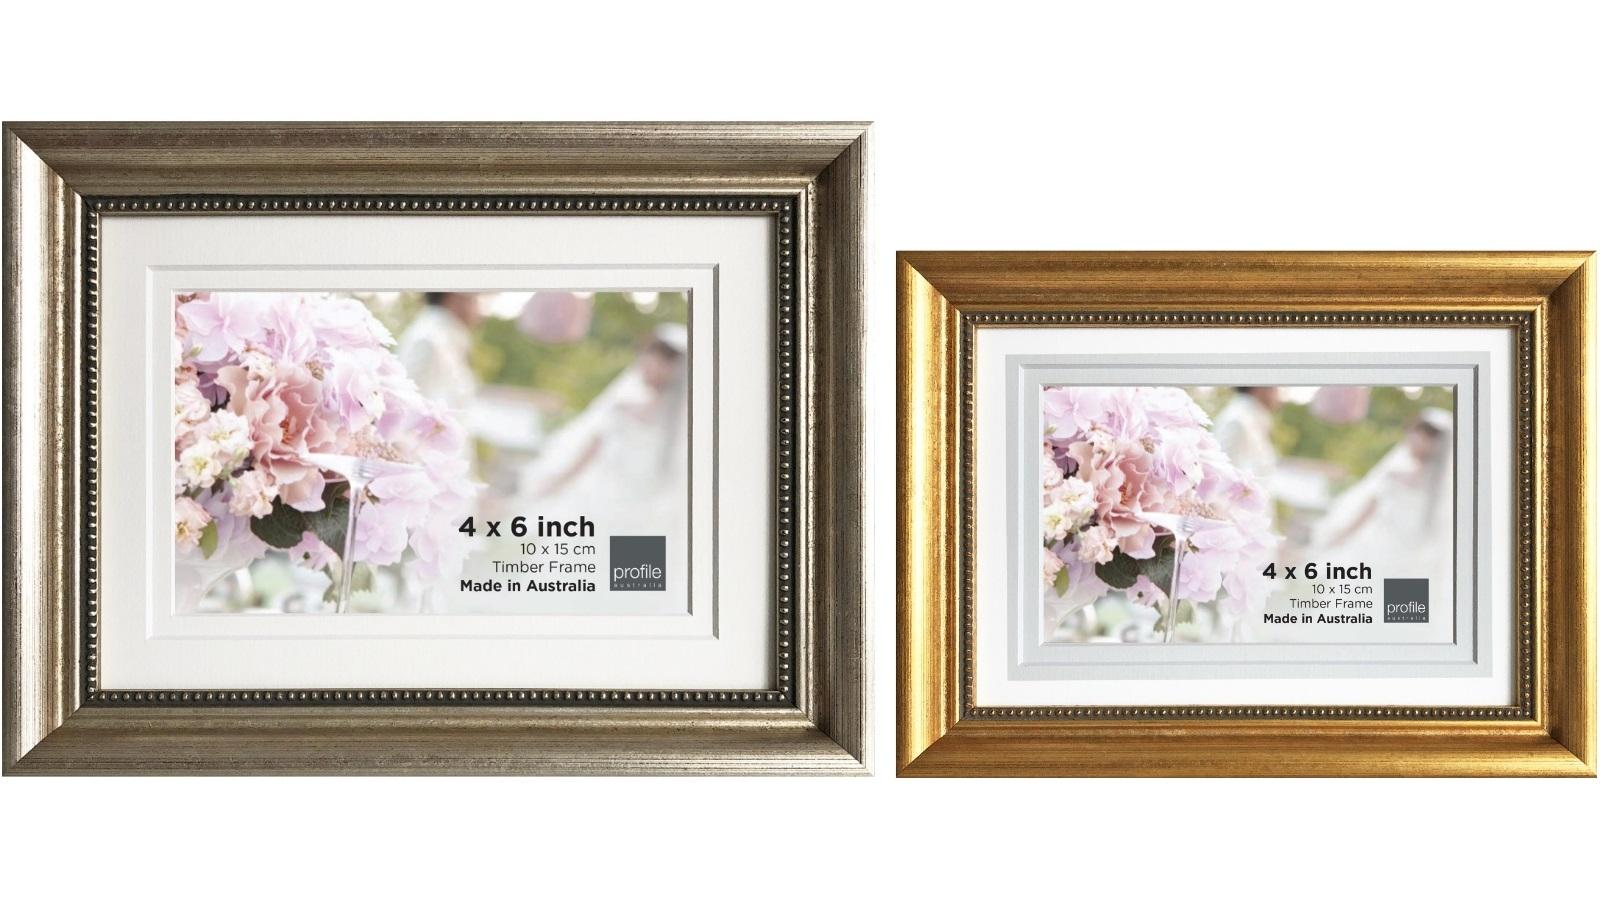 Image of Platinum Majestic 10x15cm Photo Frame